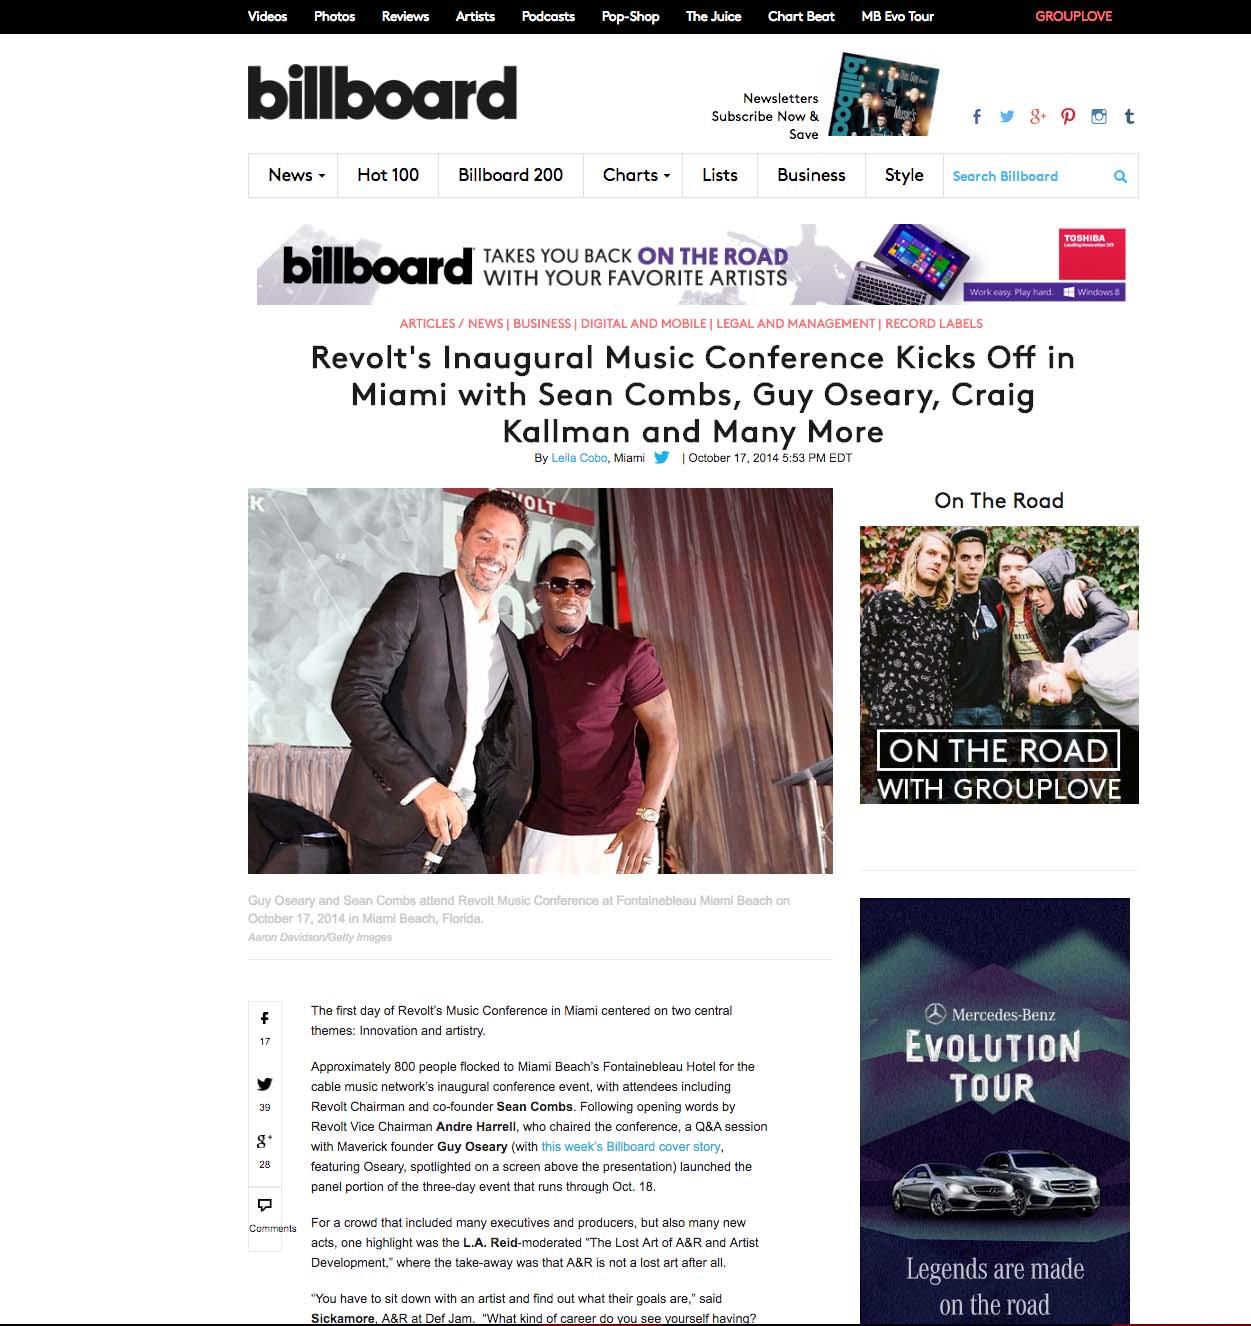 Bilboard.com Guy Oseary and Sean Combs